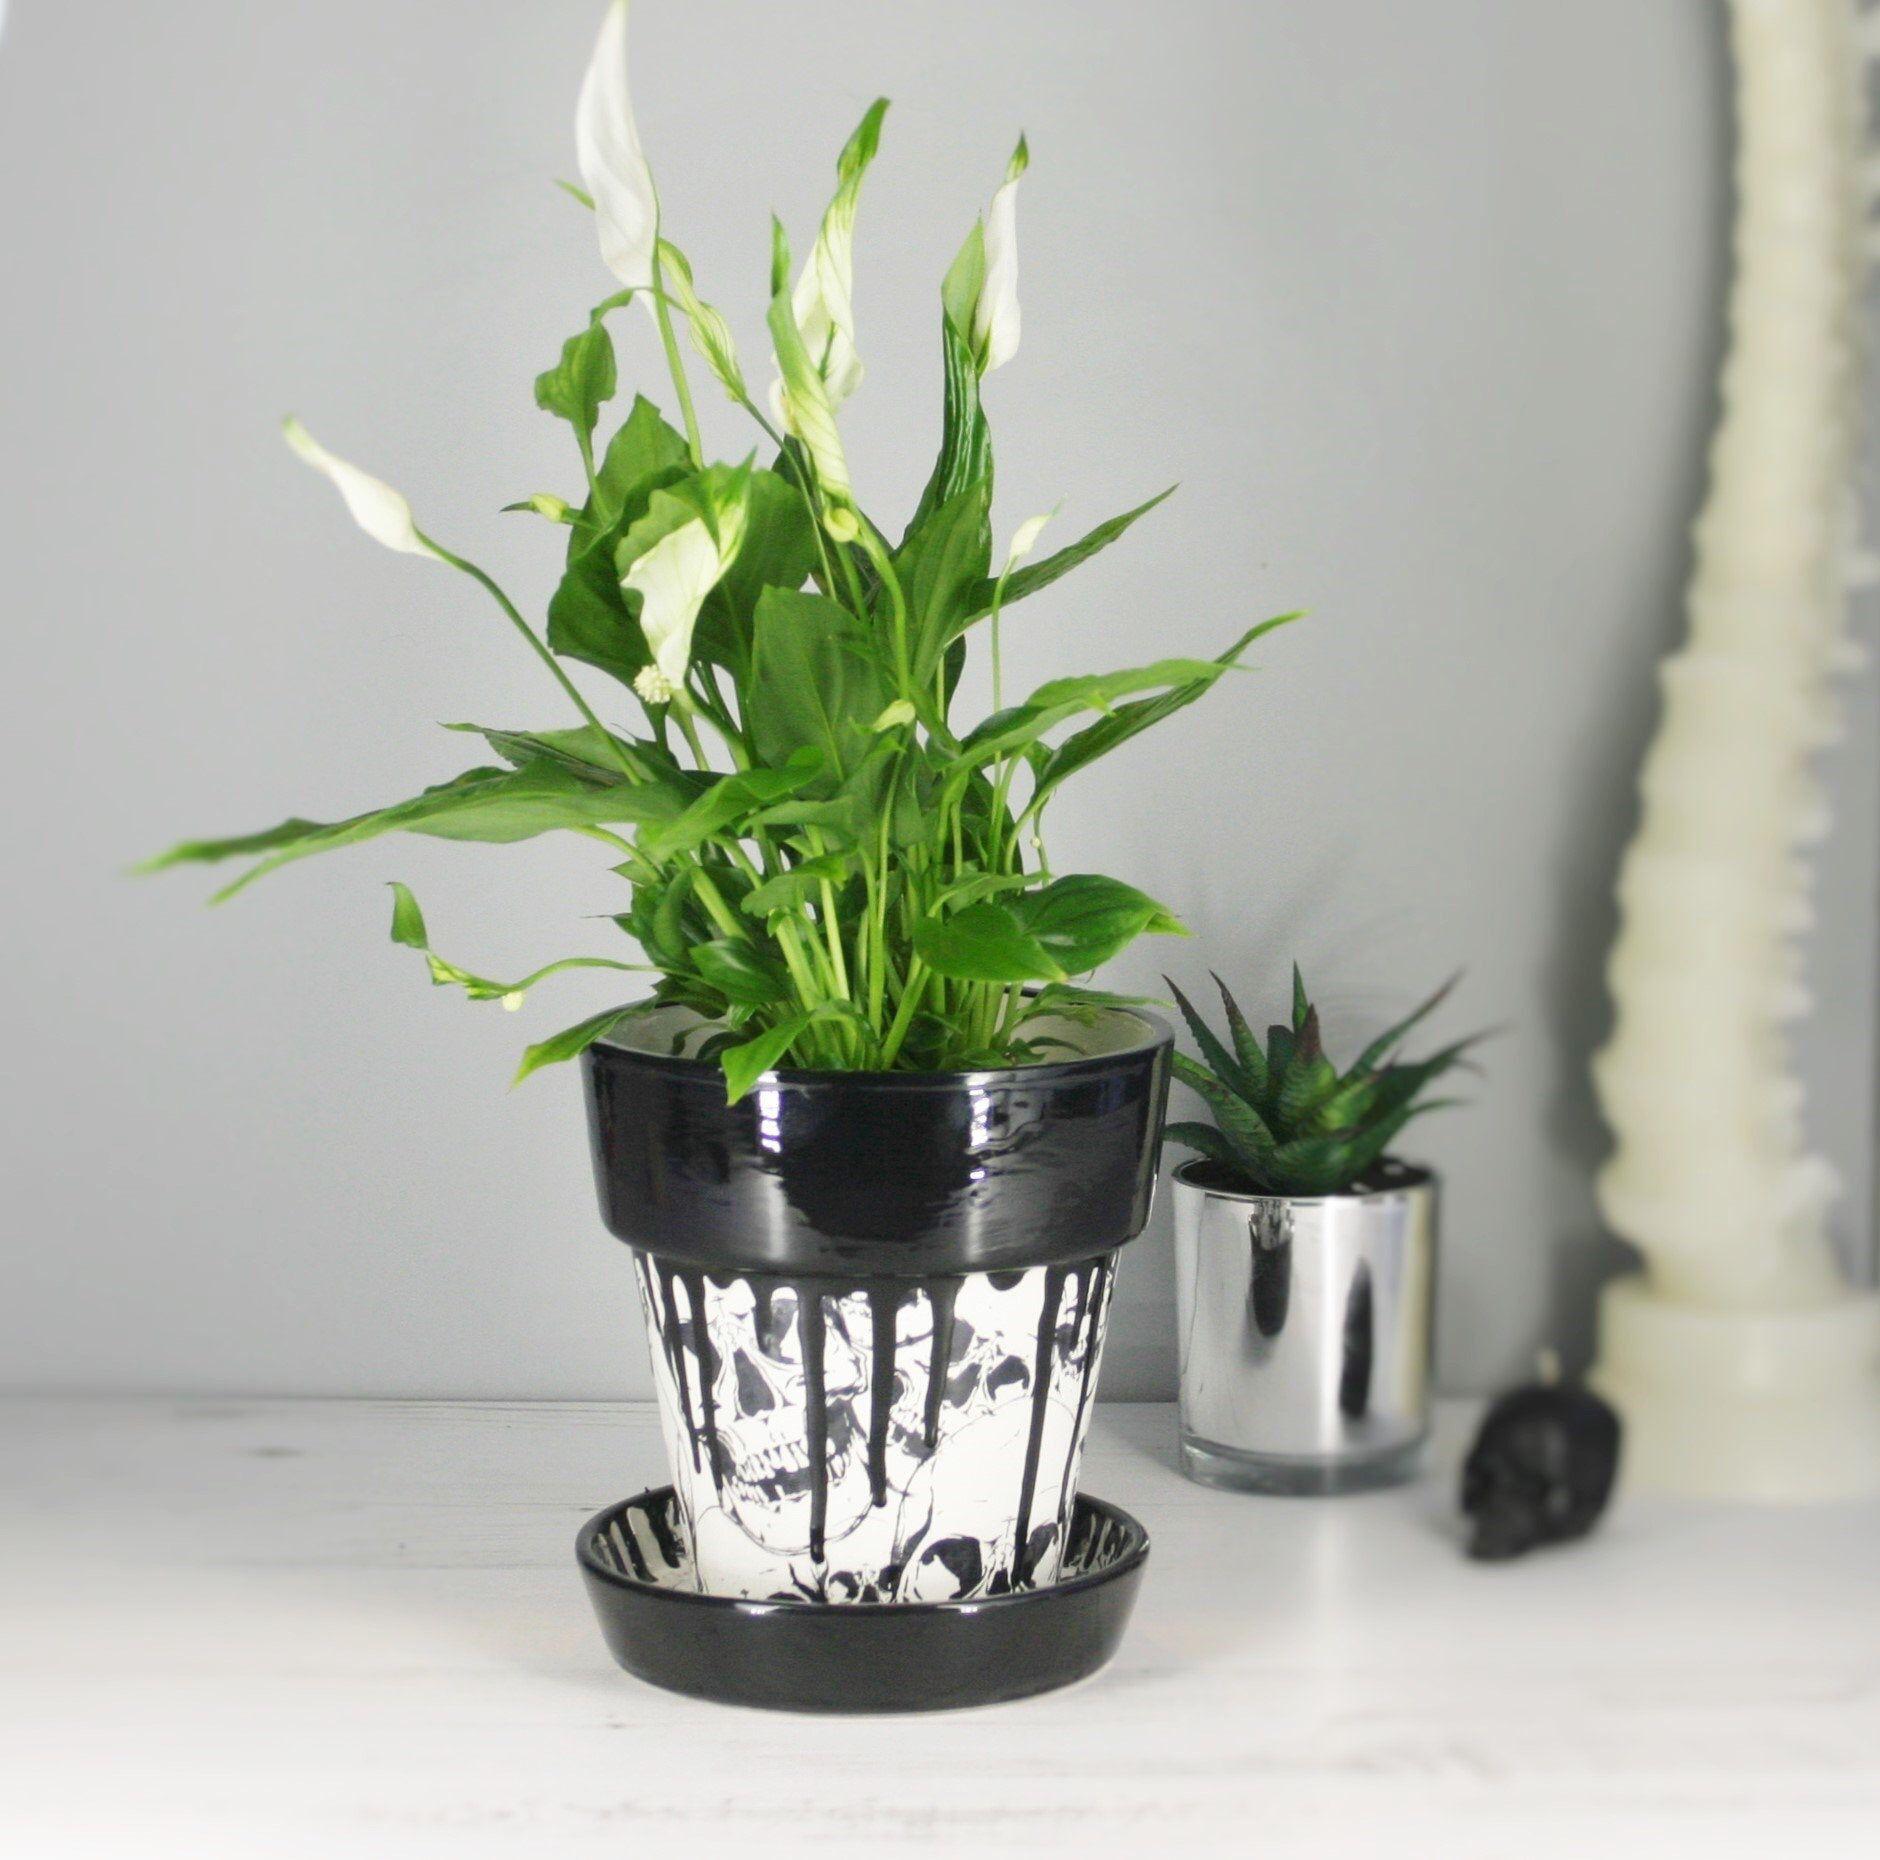 Decorative Ceramic Indoor Wall Planter Skull